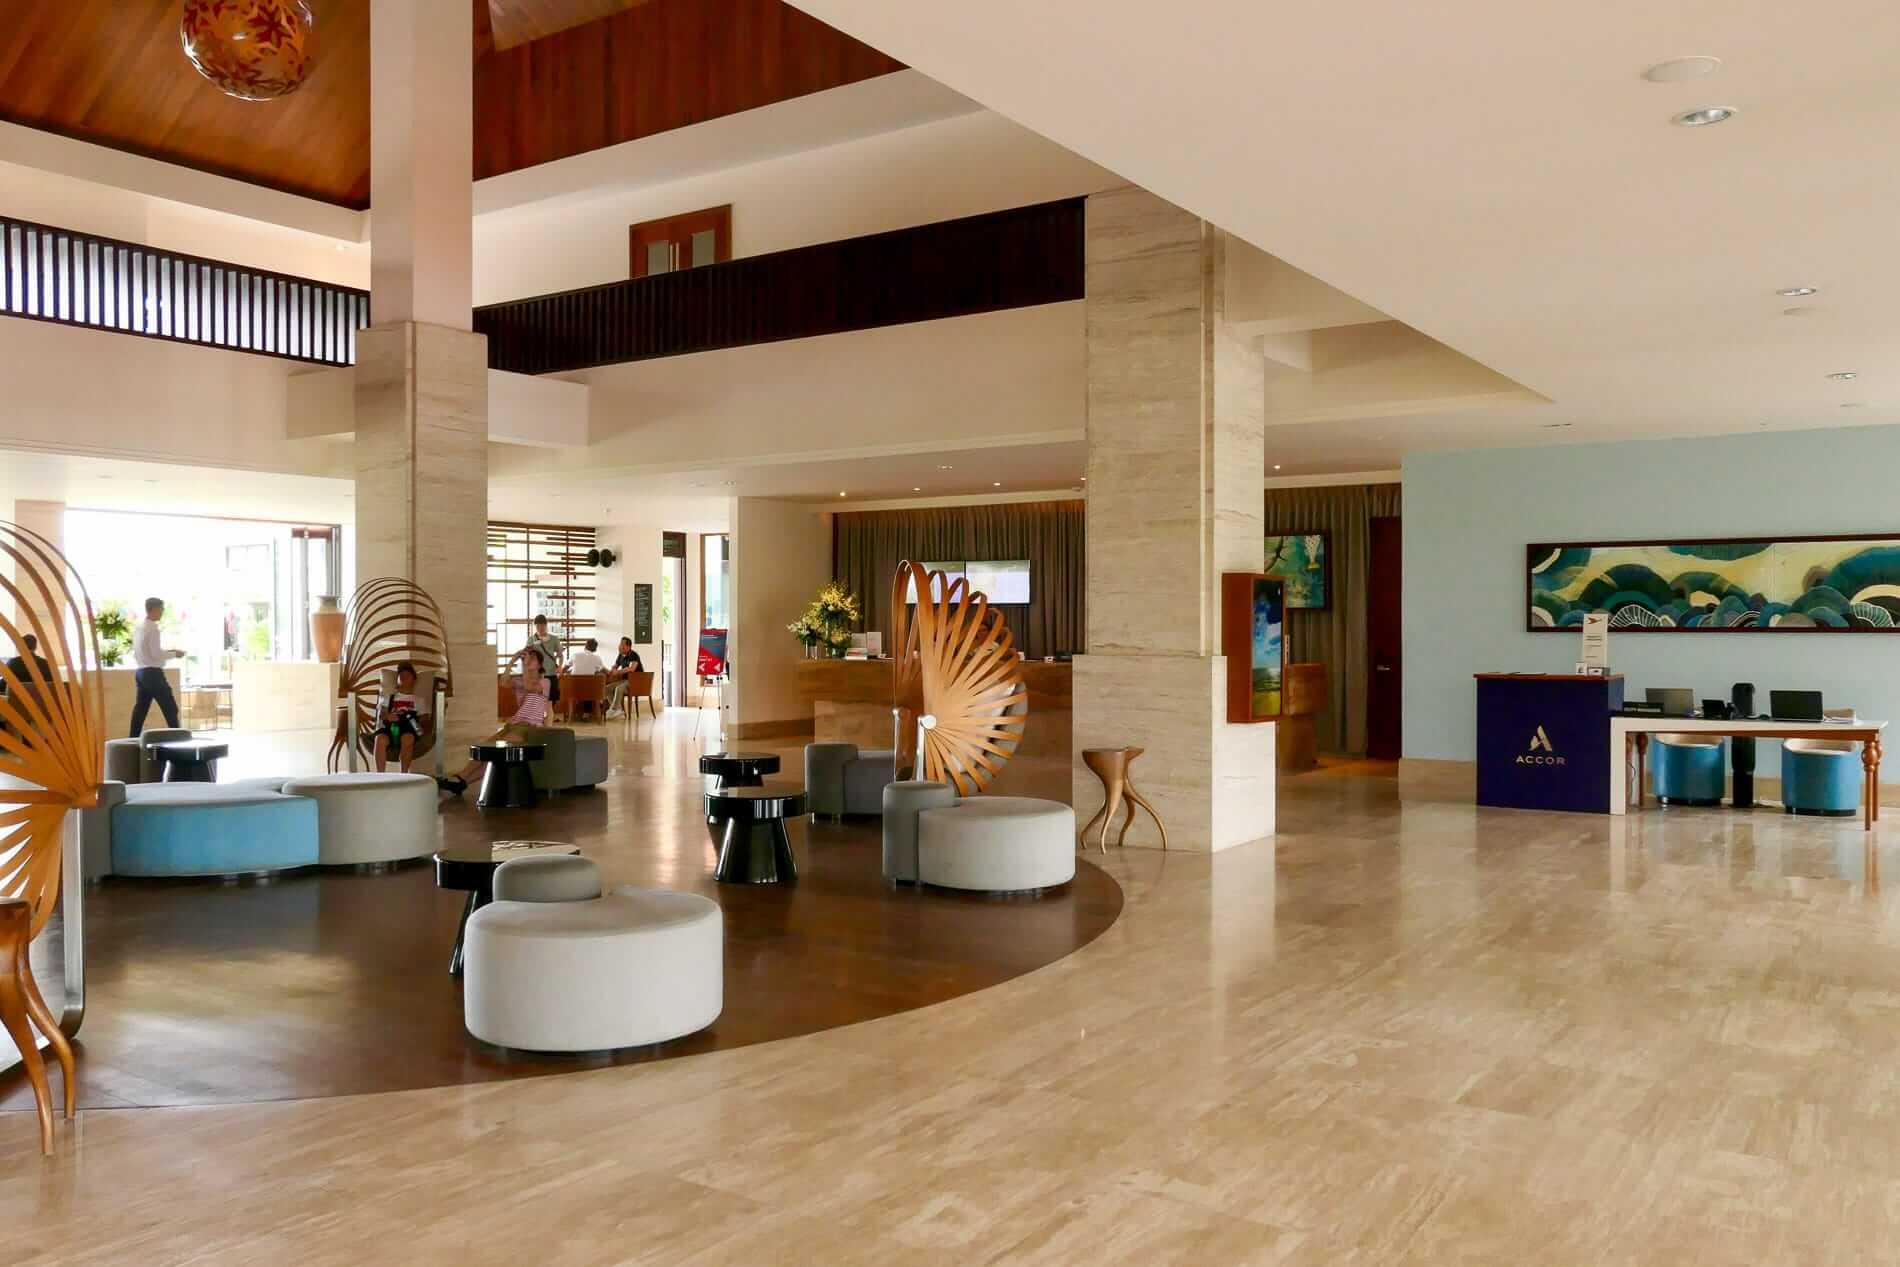 reception are a of Pullman Resort Da nang